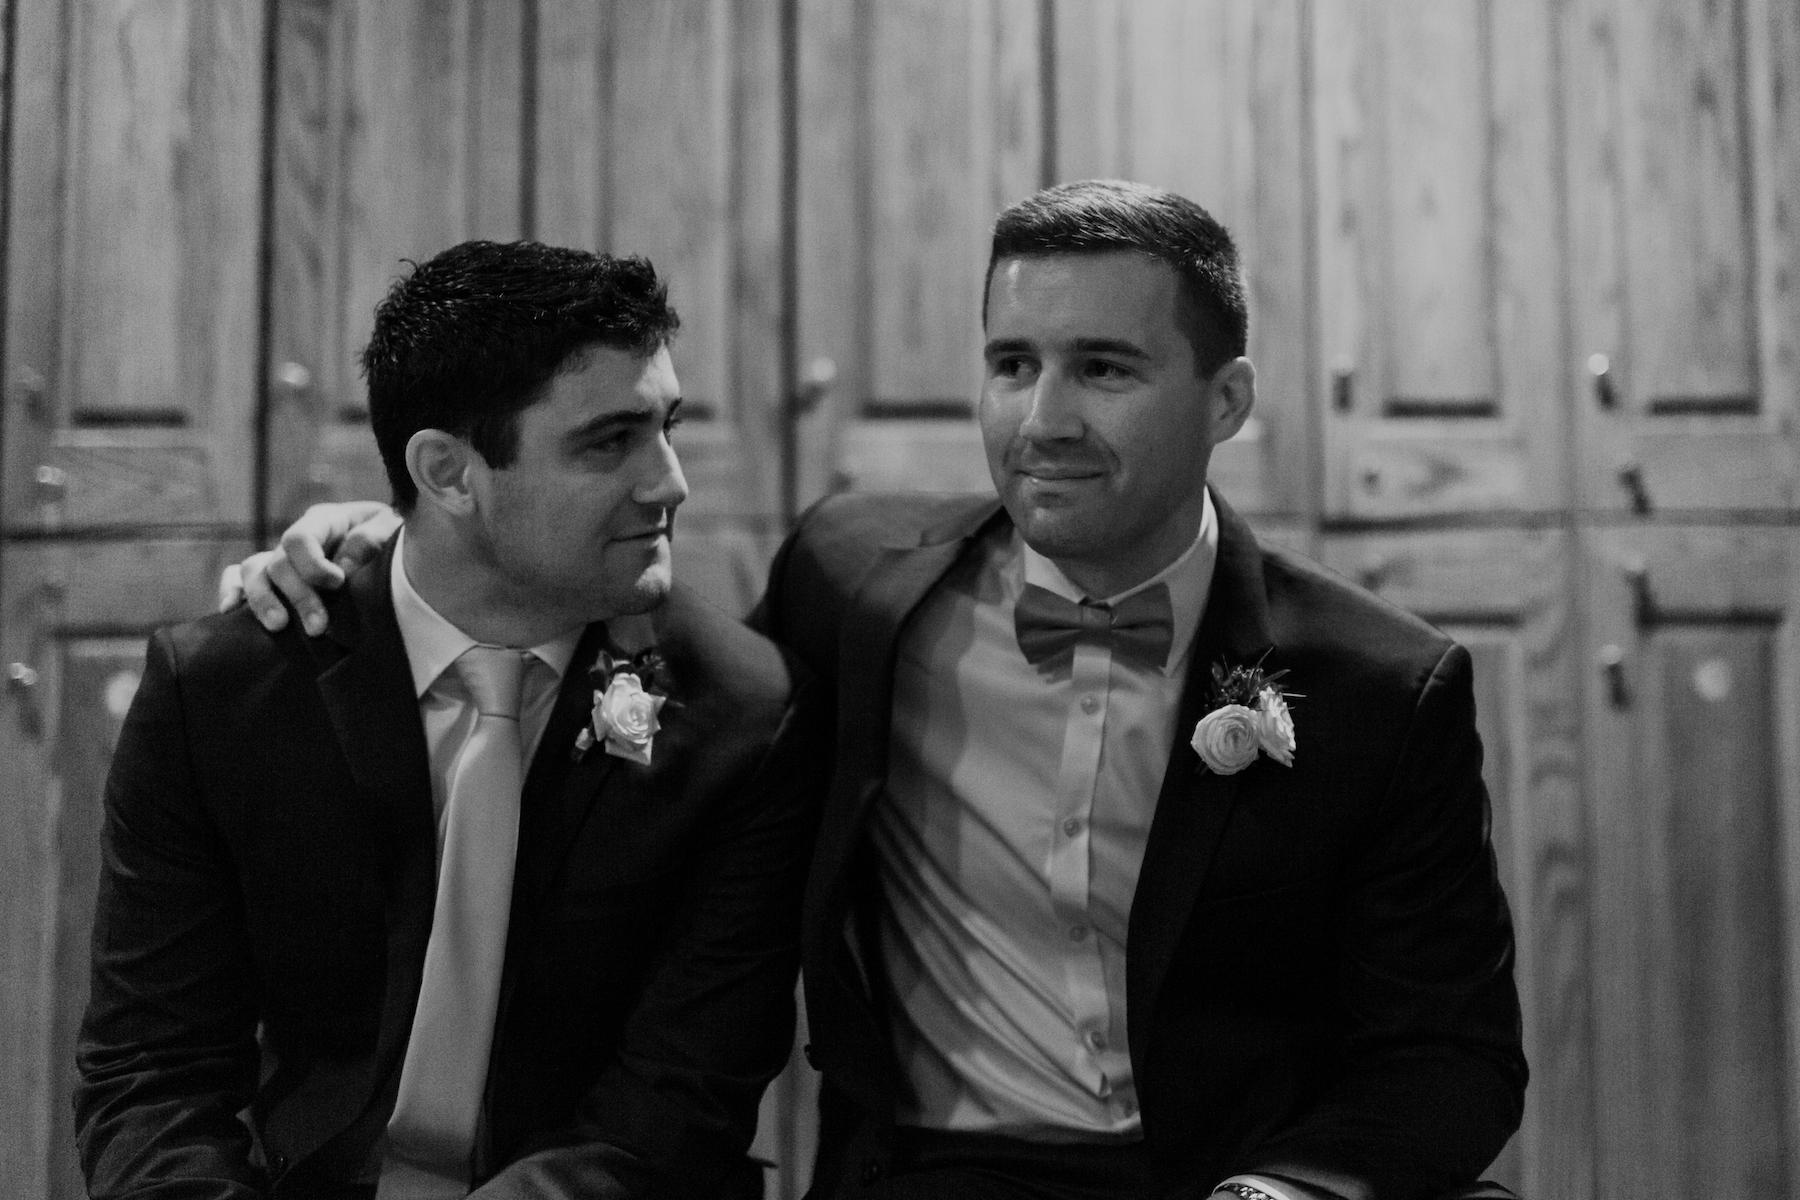 wedding-engagement-photographer-spartanburg-greenville-columbia-carolina-south-north-470.JPG